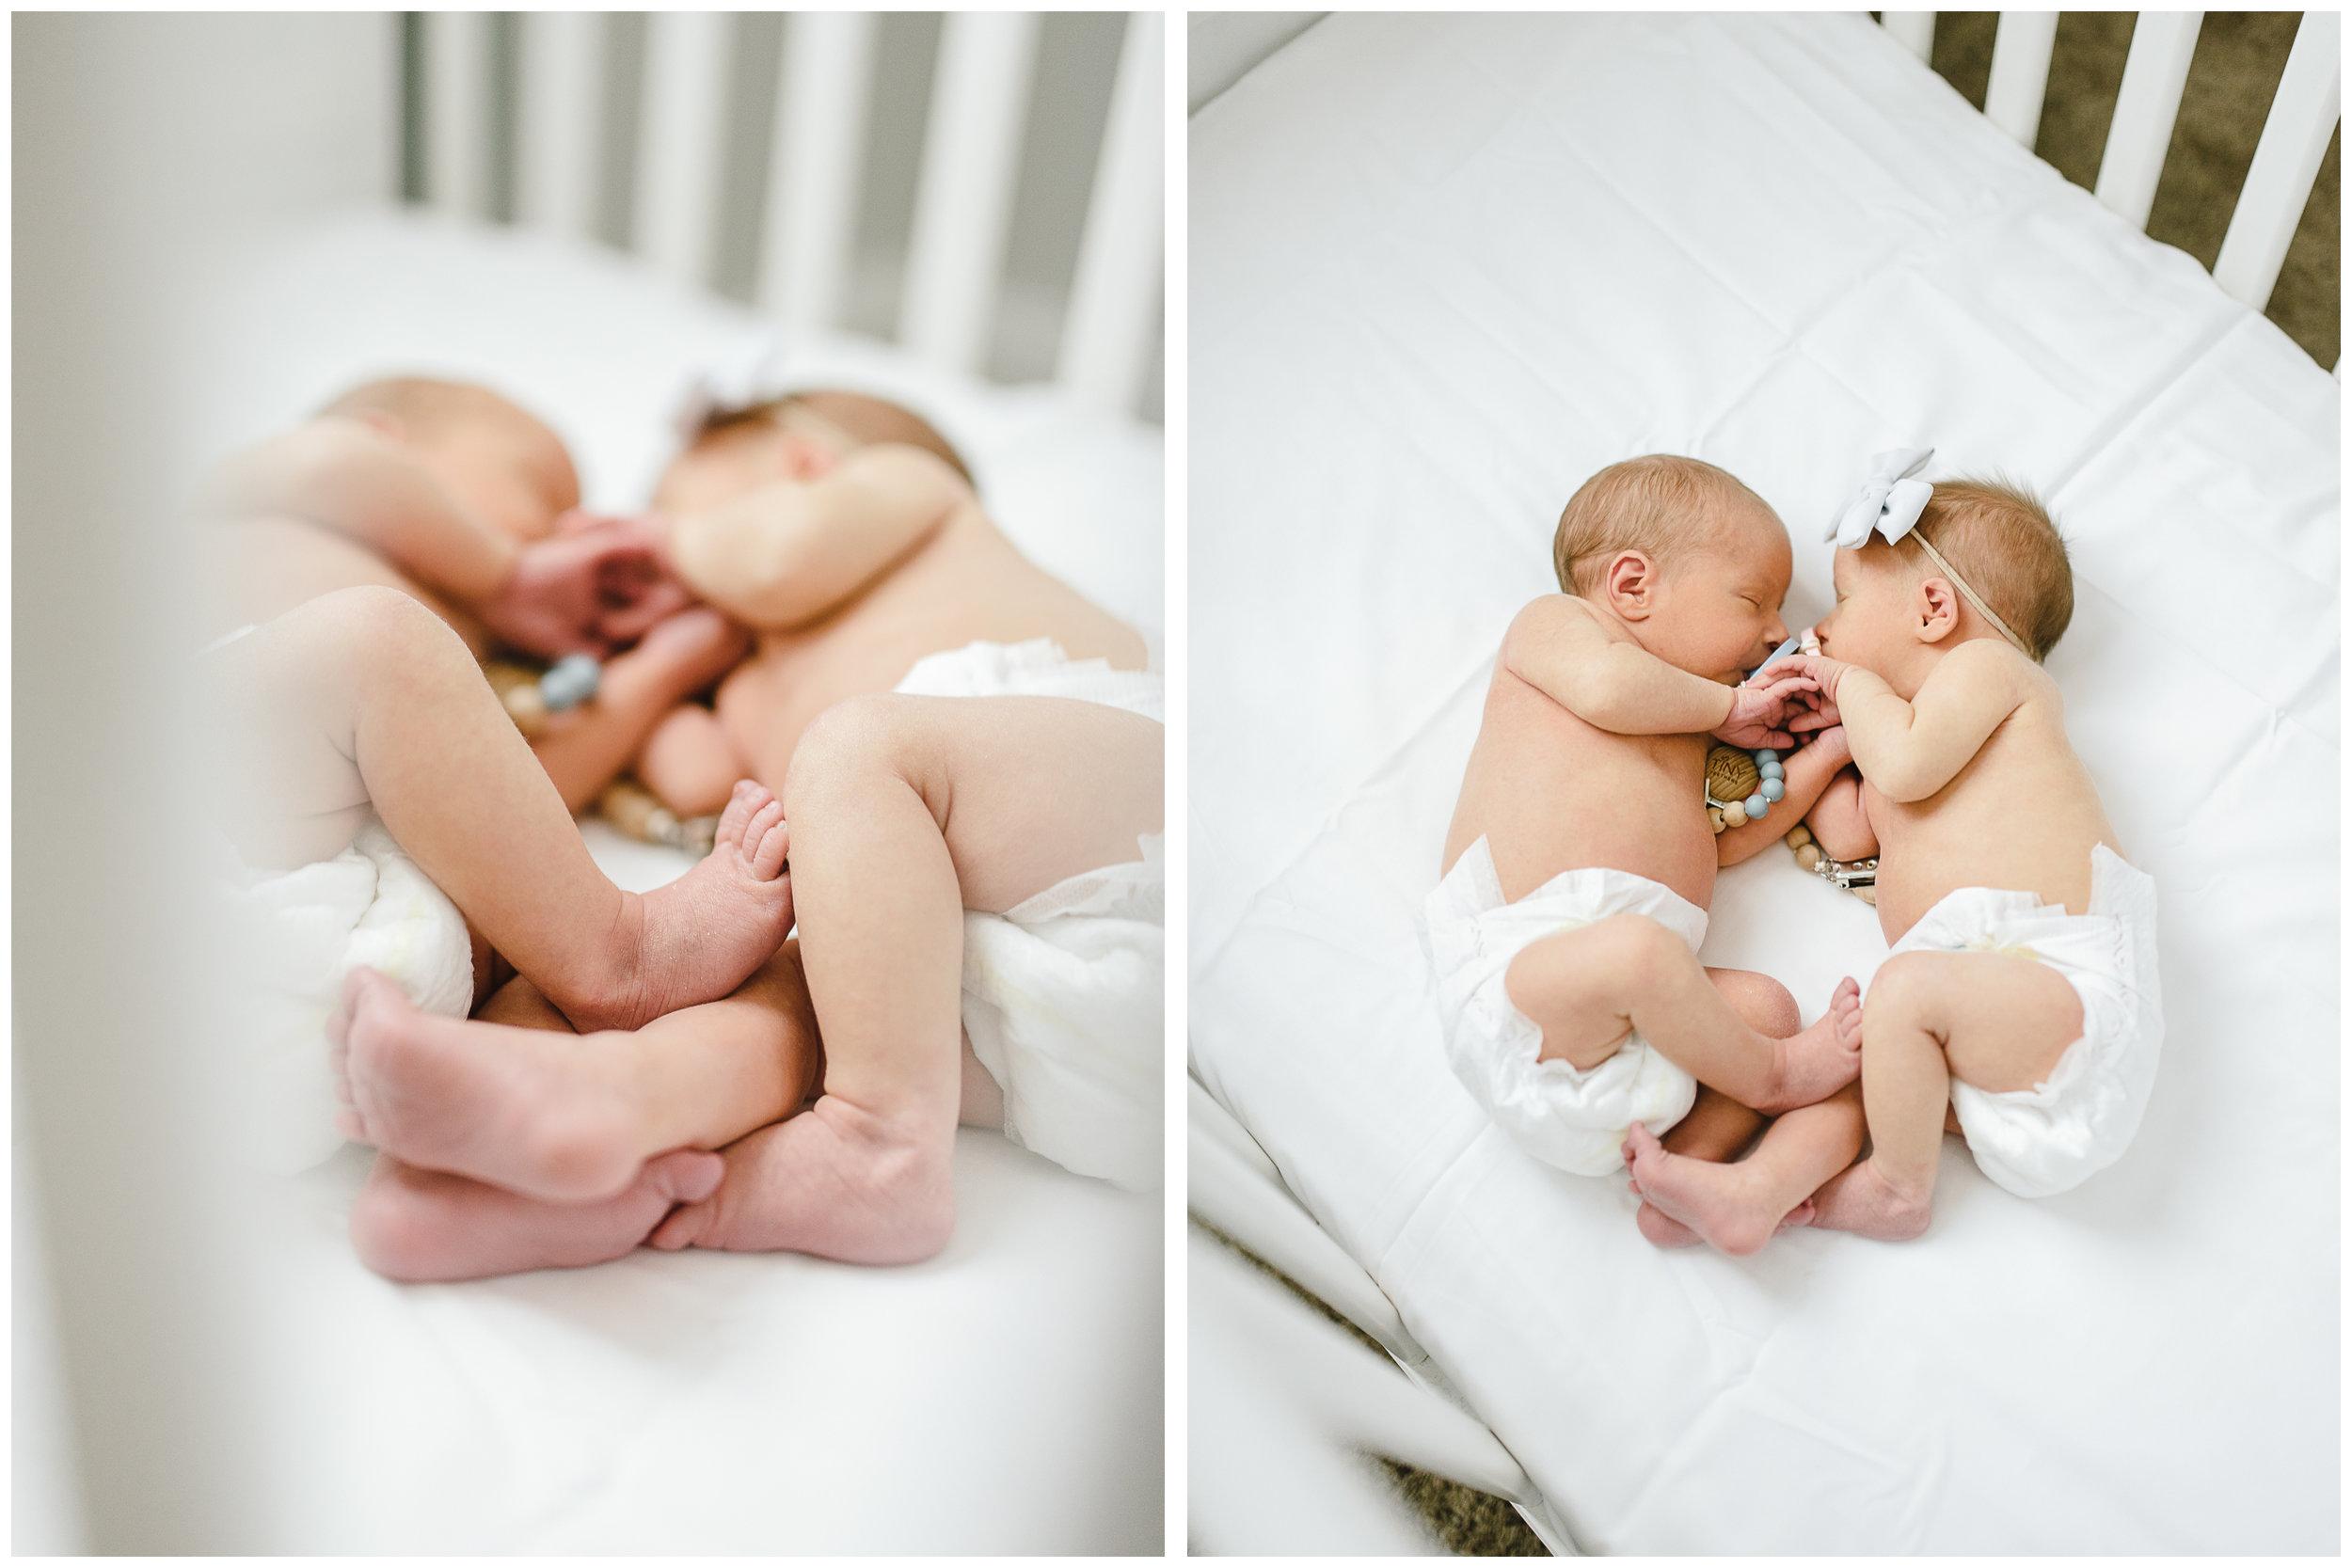 Heather Wagner Newborn Photographer.jpg